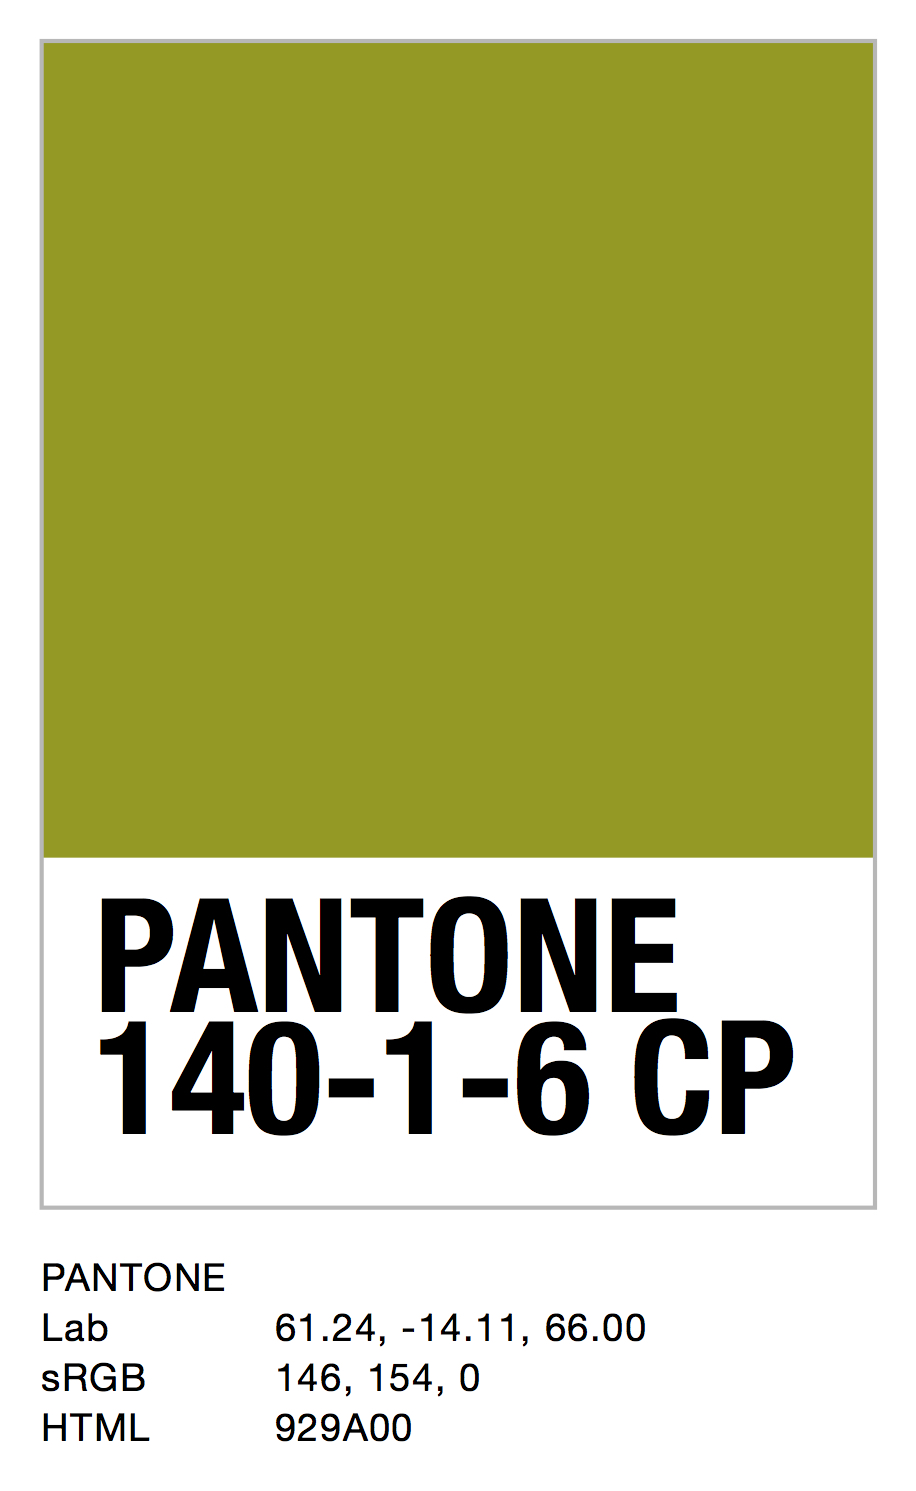 PANTONE 140-1-6 CP.jpg